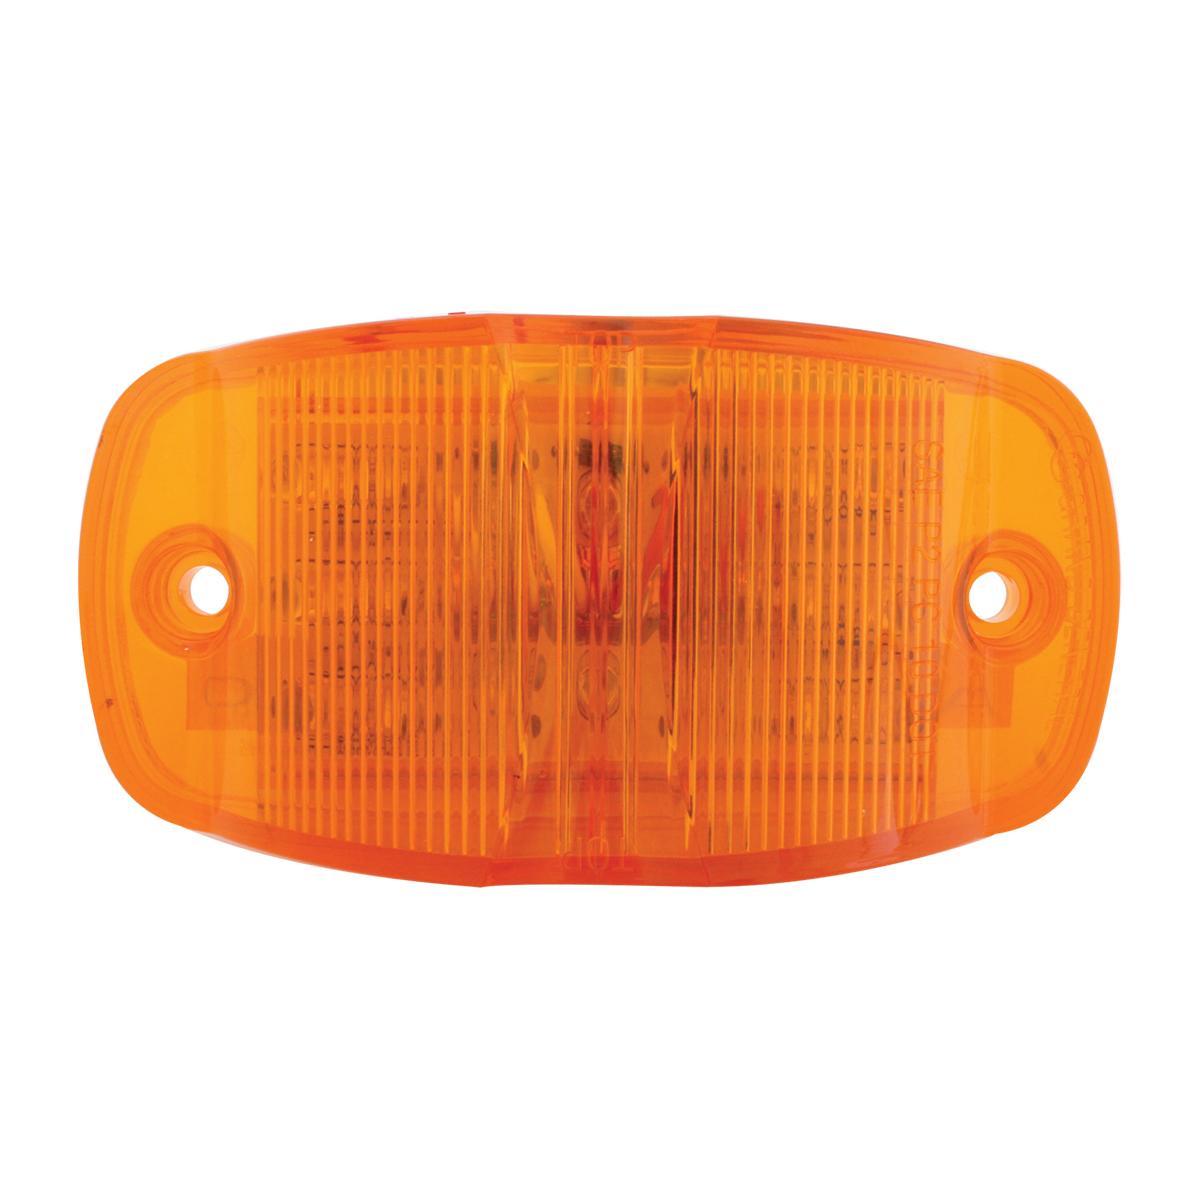 75160 Rectangular Camel Back Wide Angle Dual Function LED Light